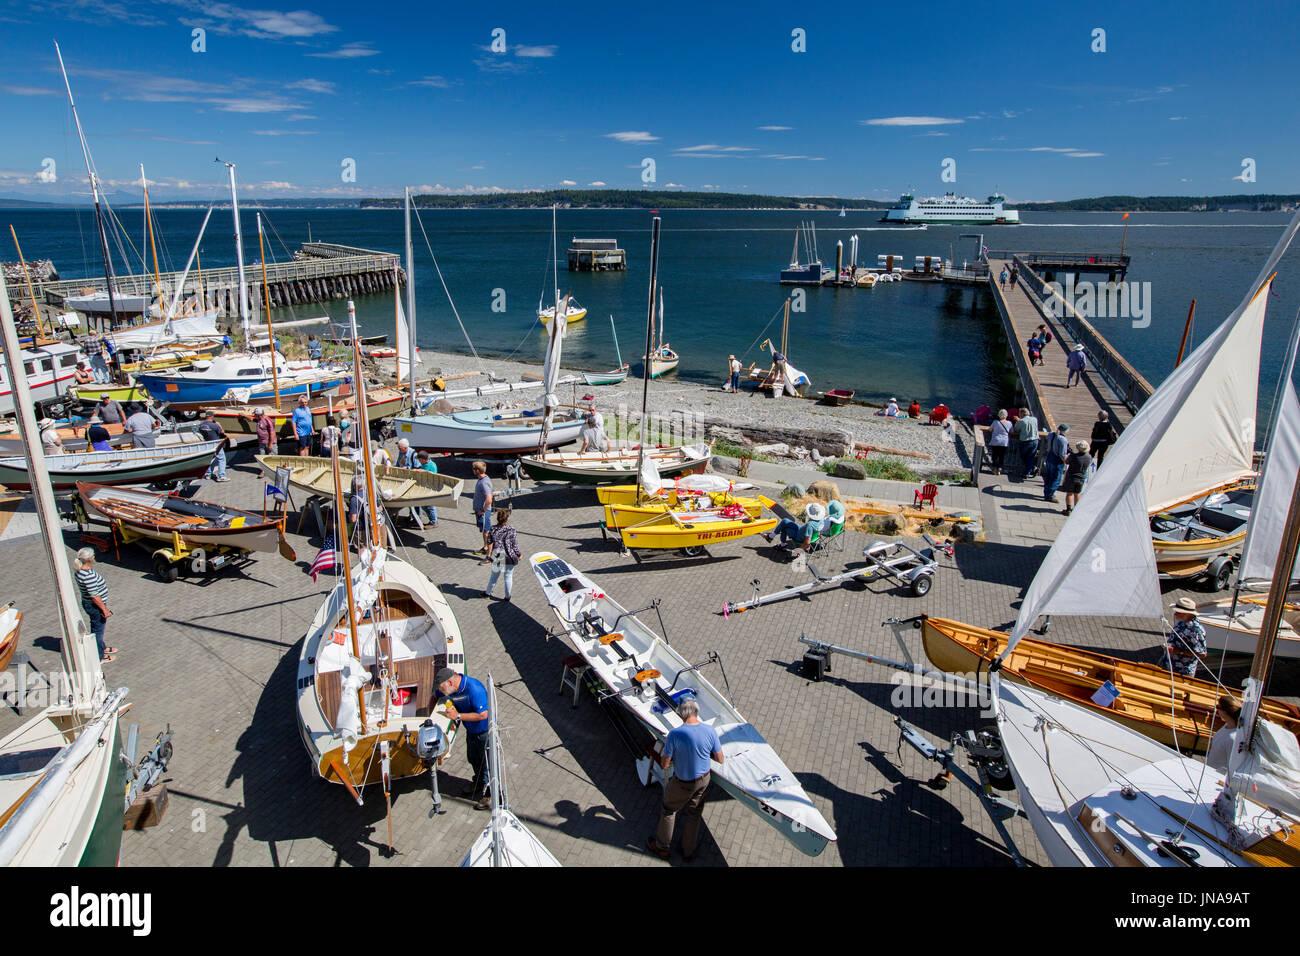 Port Townsend Pocket Yacht Palooza boat show at the Northwest Maritime Center. - Stock Image